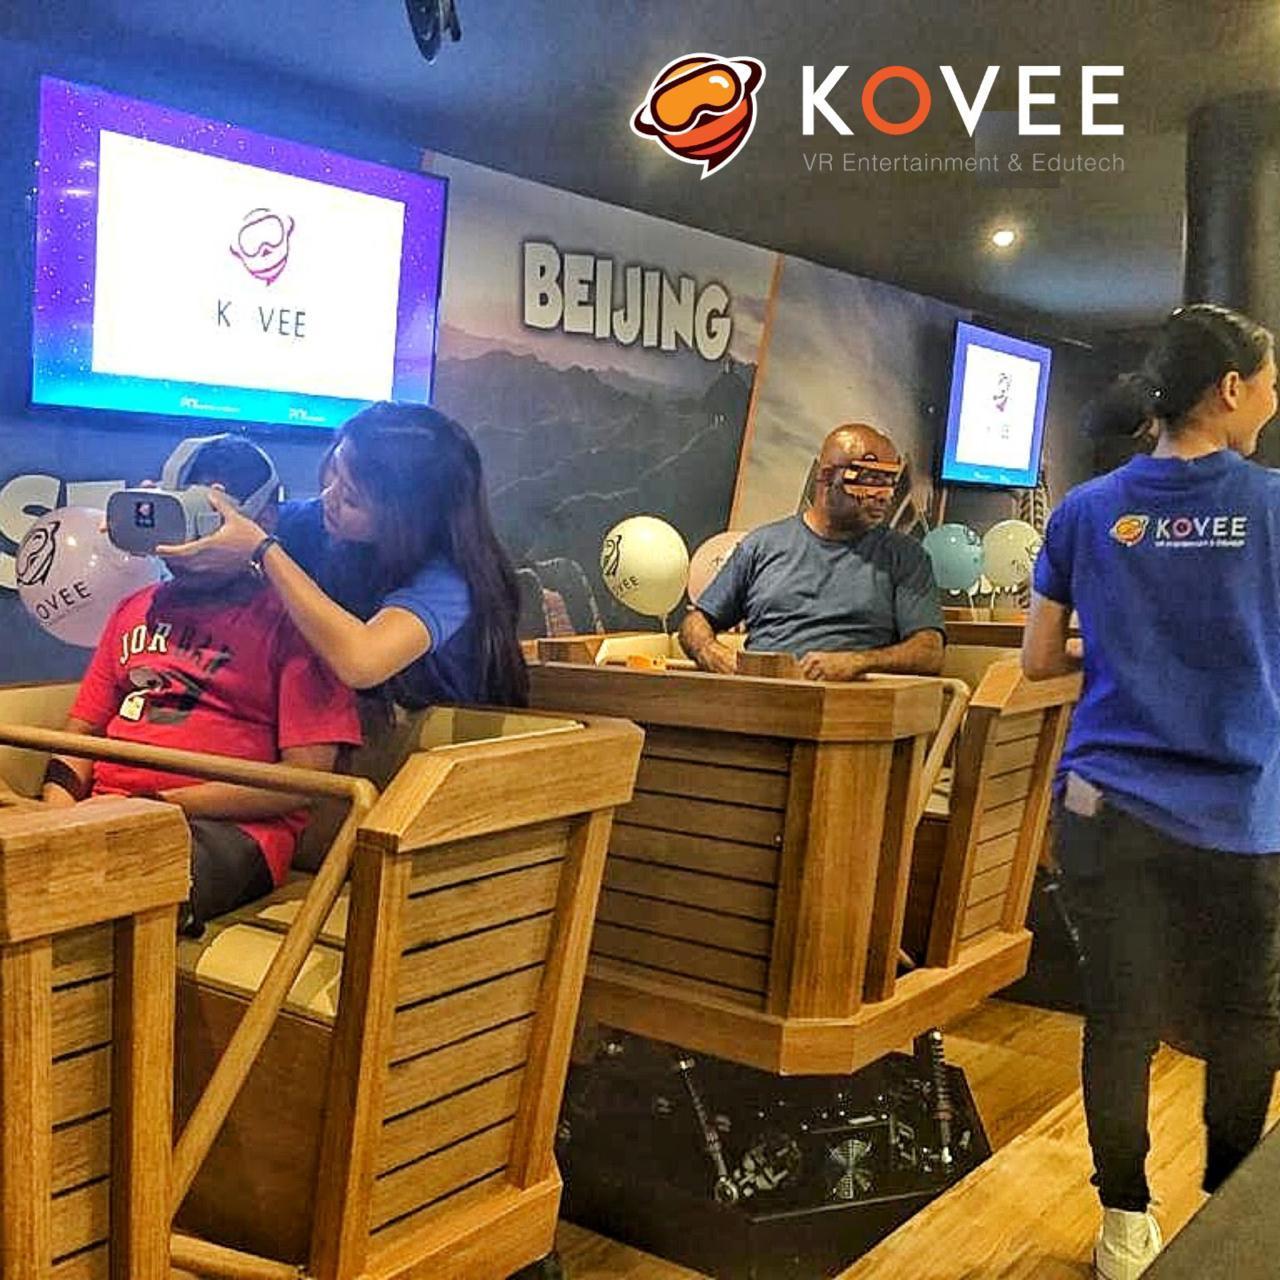 Kovee VR Kuta Bali